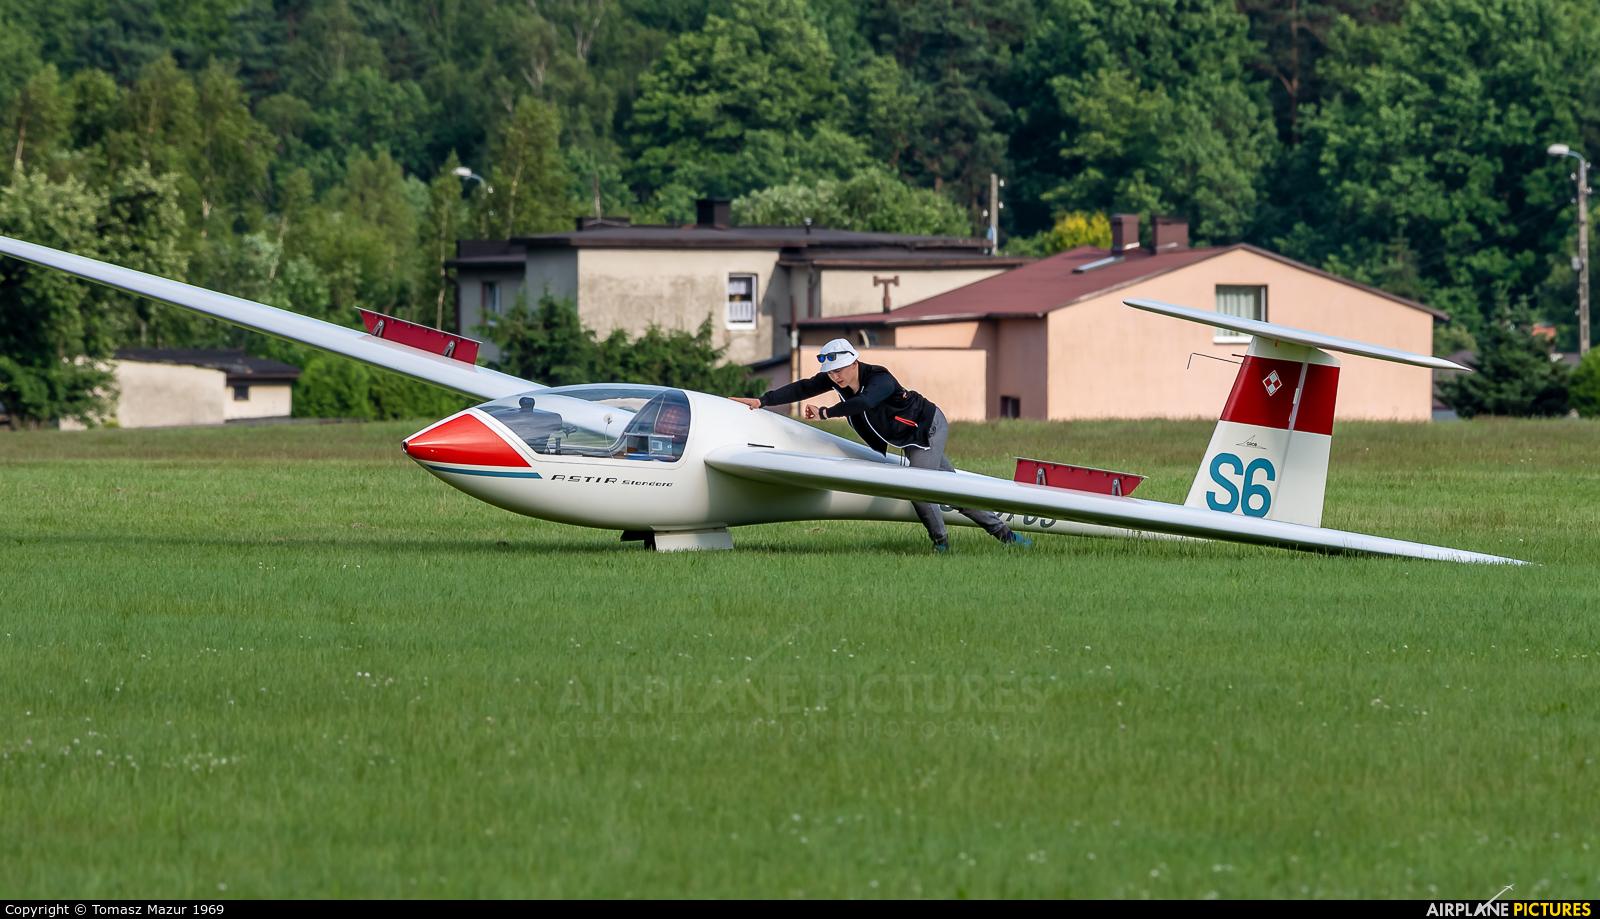 Aeroclub ROW SP-3703 aircraft at Rybnik - Gotartowice